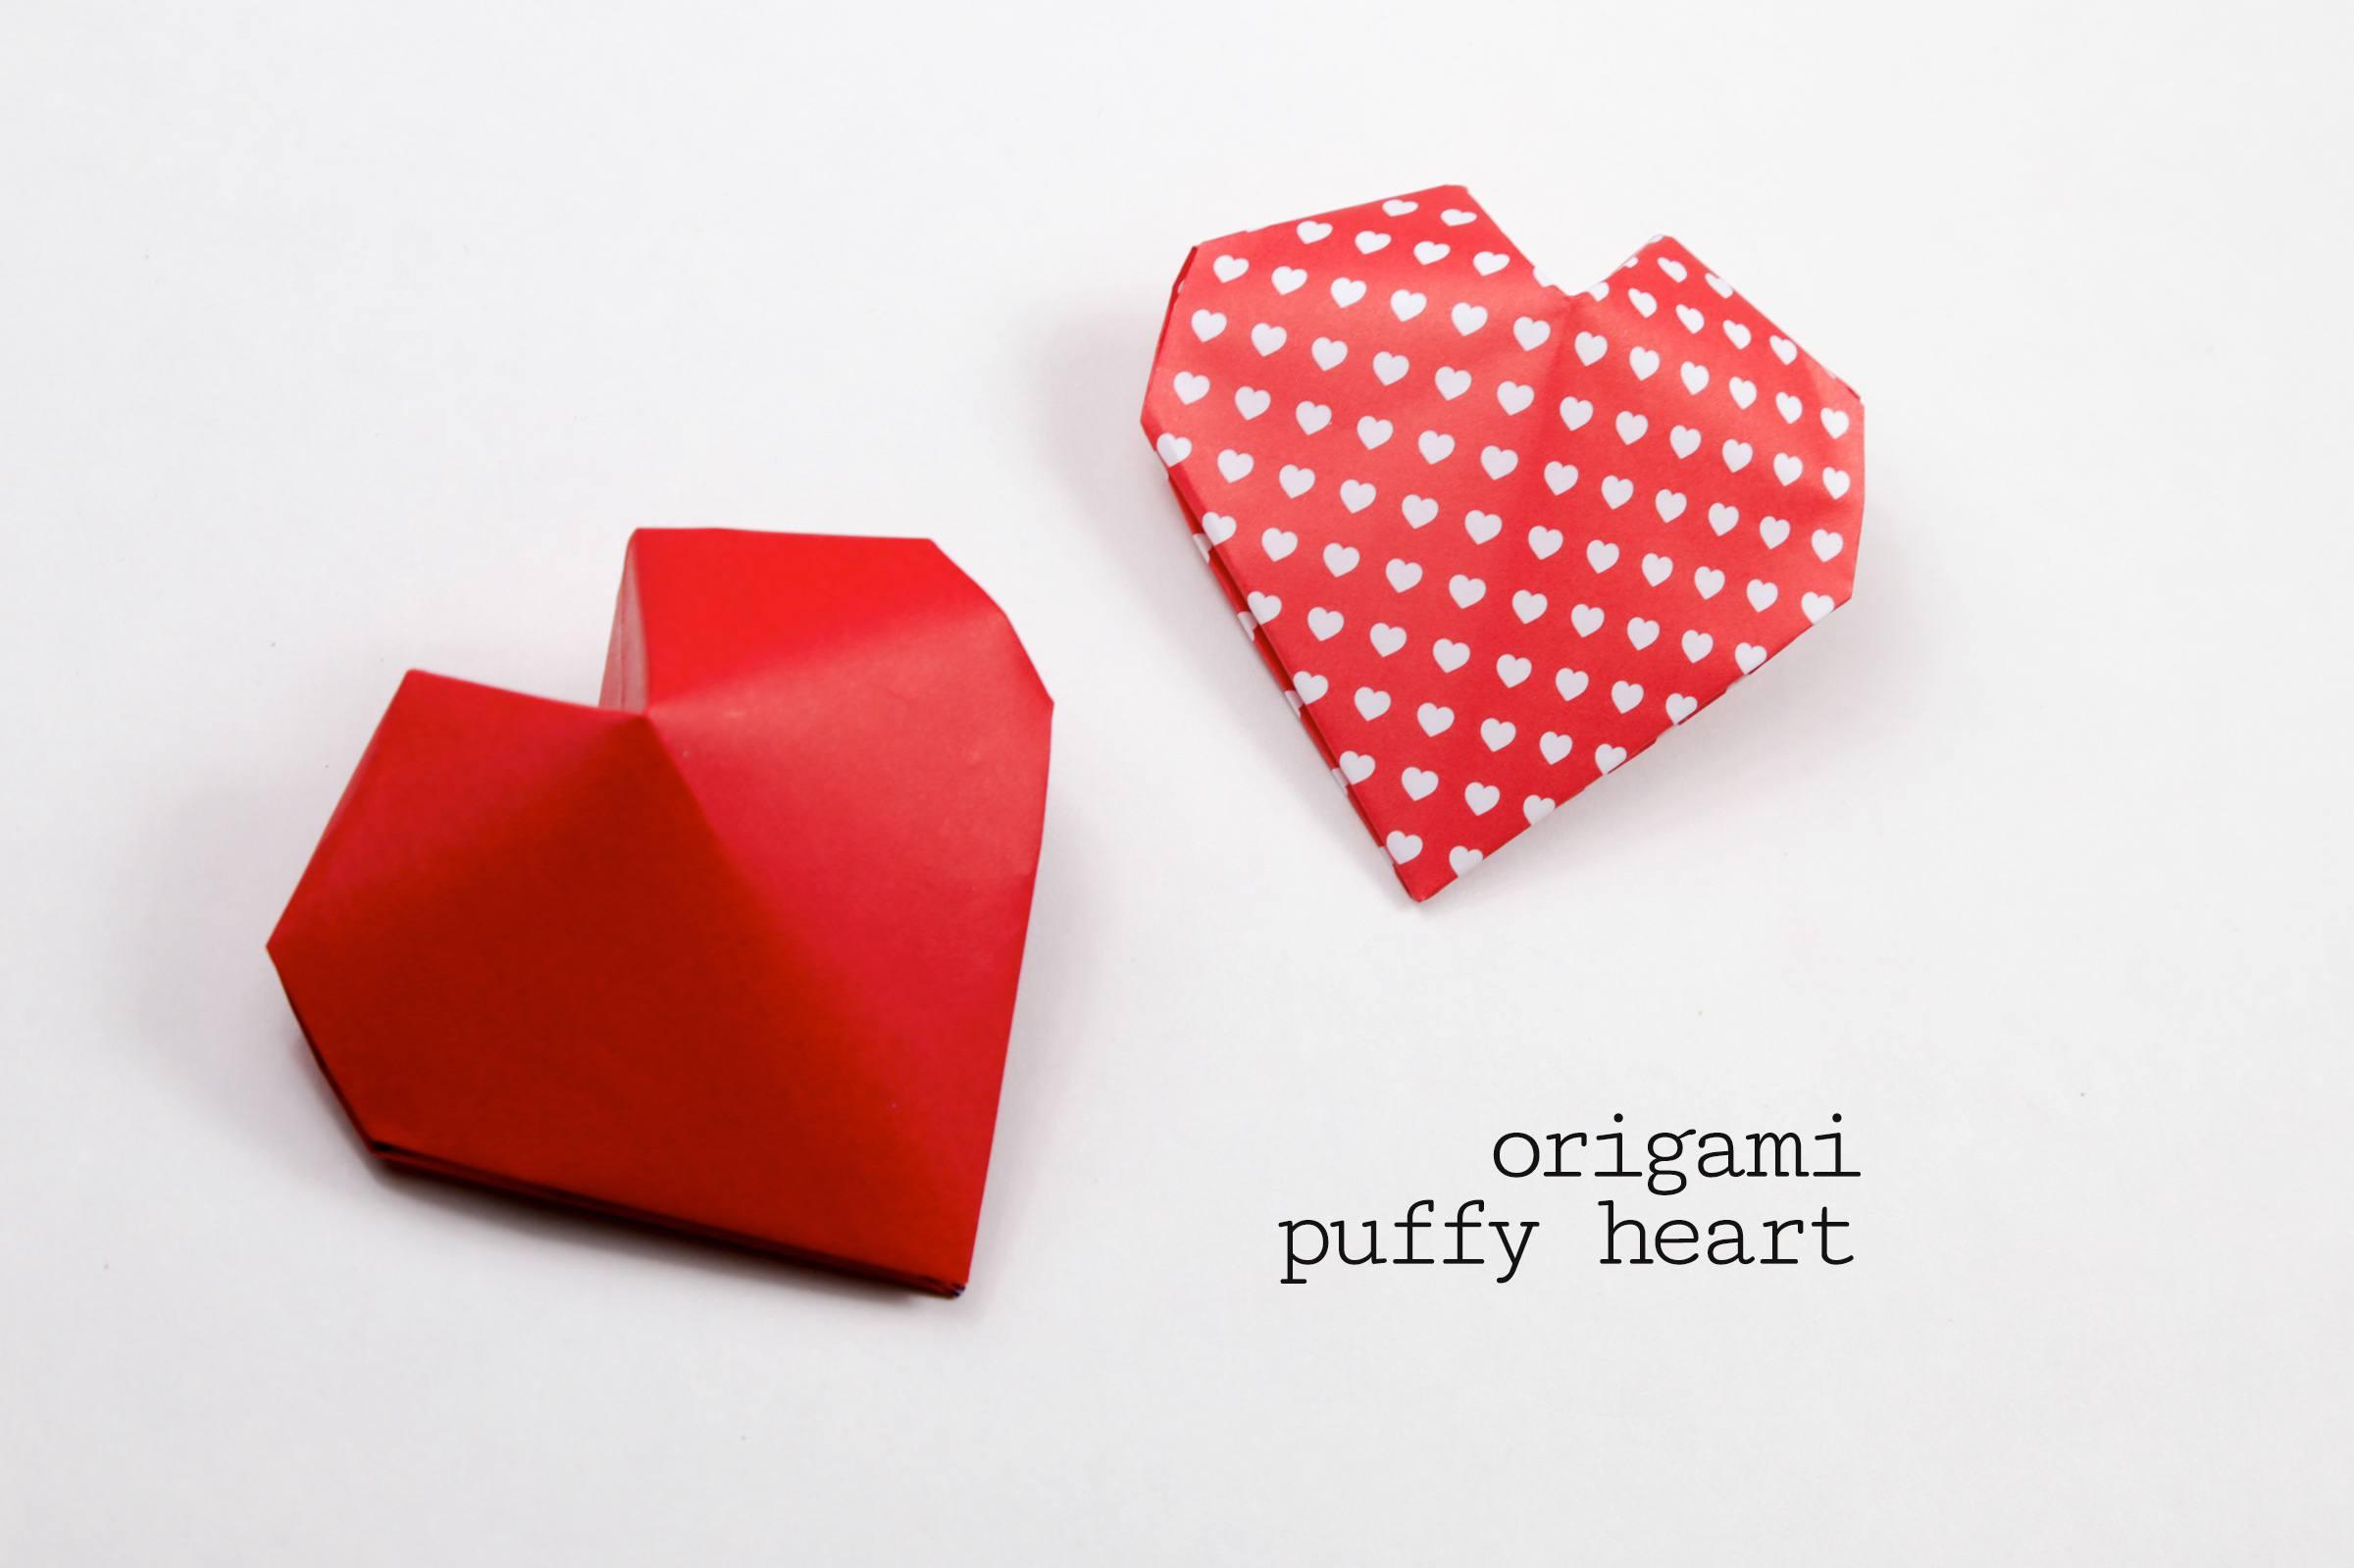 Origami puffy heart instructions jeuxipadfo Choice Image